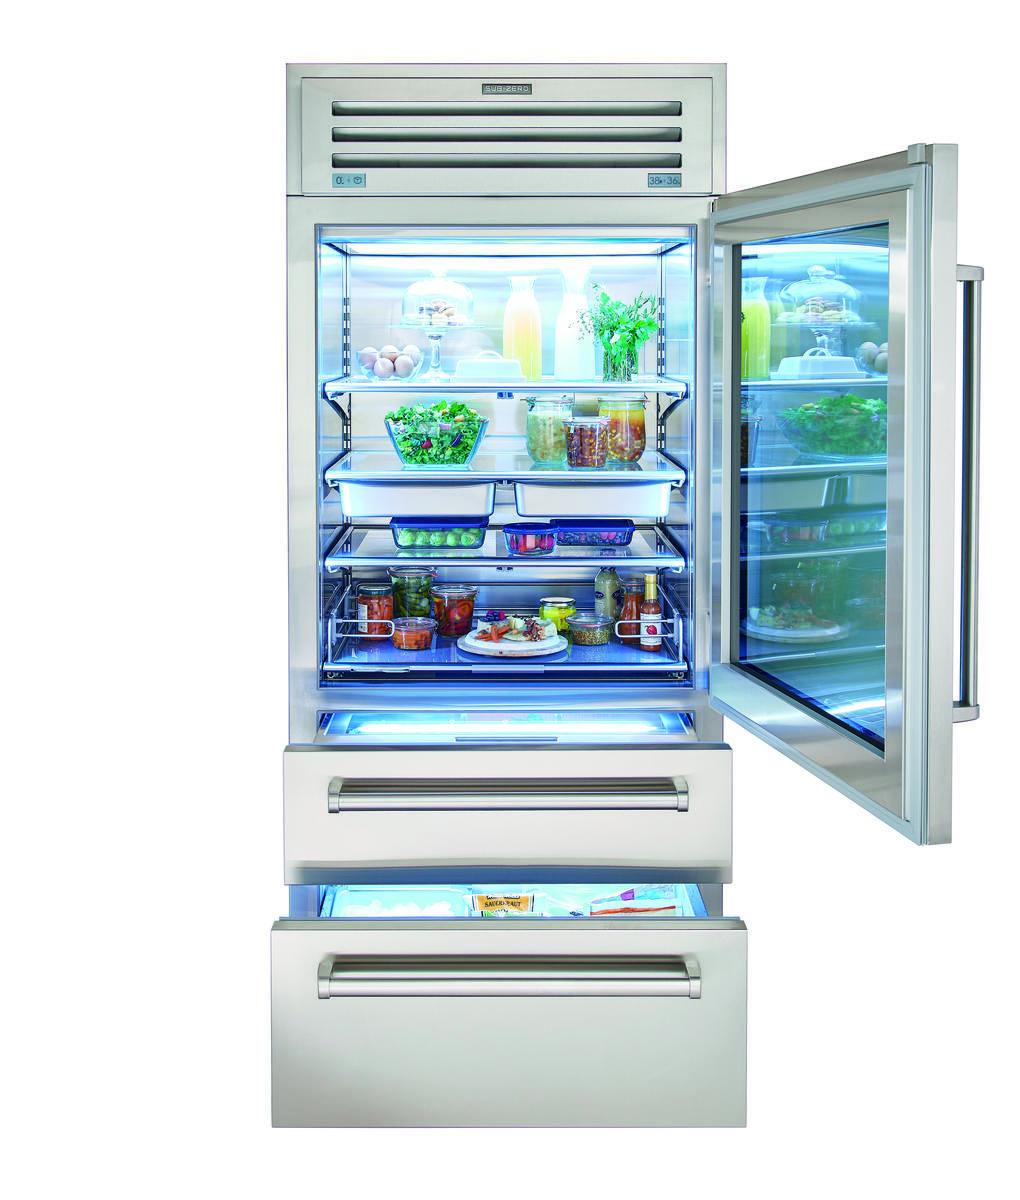 Sub Zero 36 Pro Refrigerator Freezer Pro3650 Glass Refrigerator Refrigerator Freezer Glass Door Refrigerator